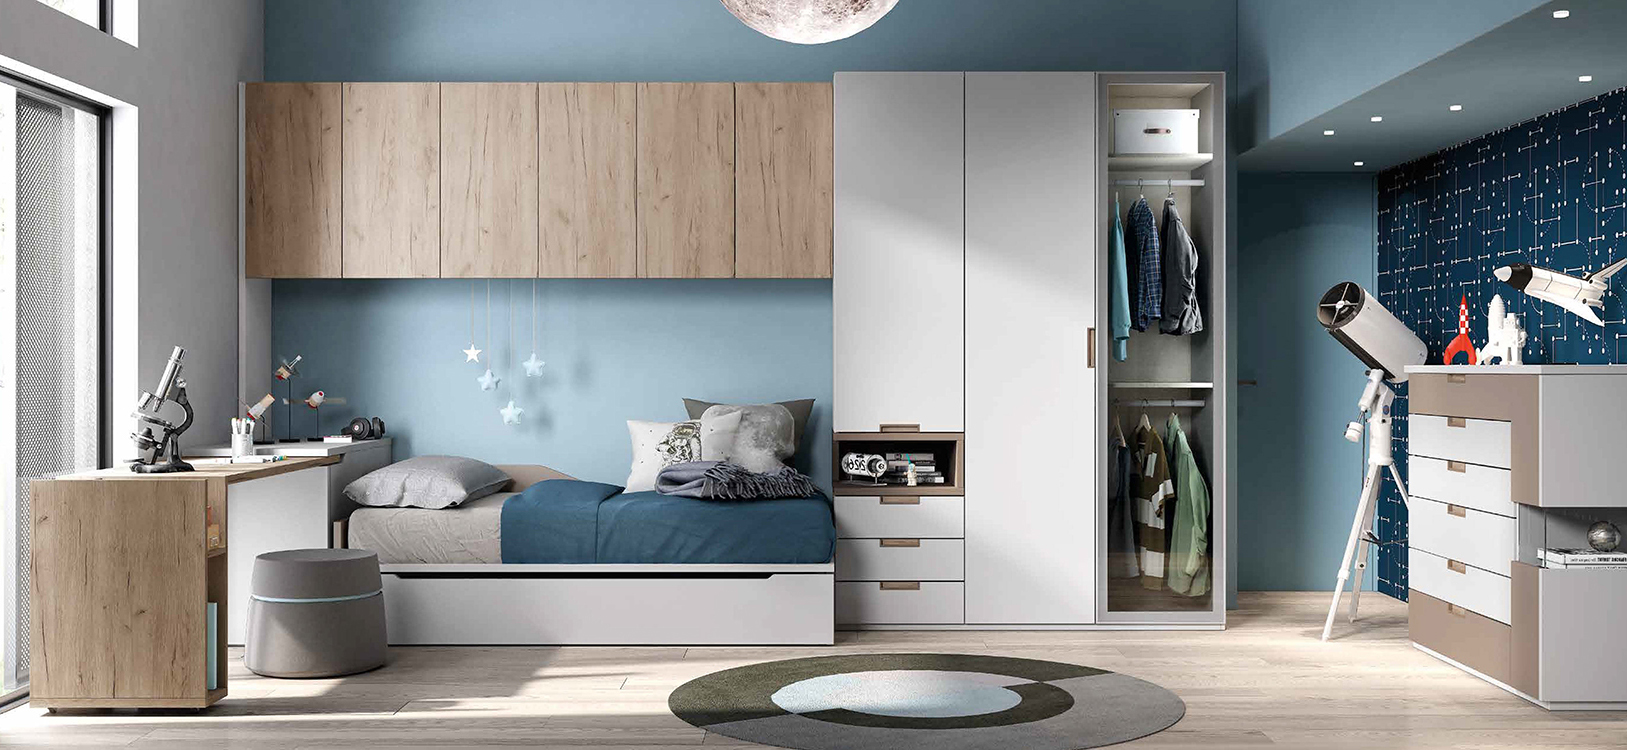 Precio dormitorios juveniles for Dormitorios juveniles modernos precios